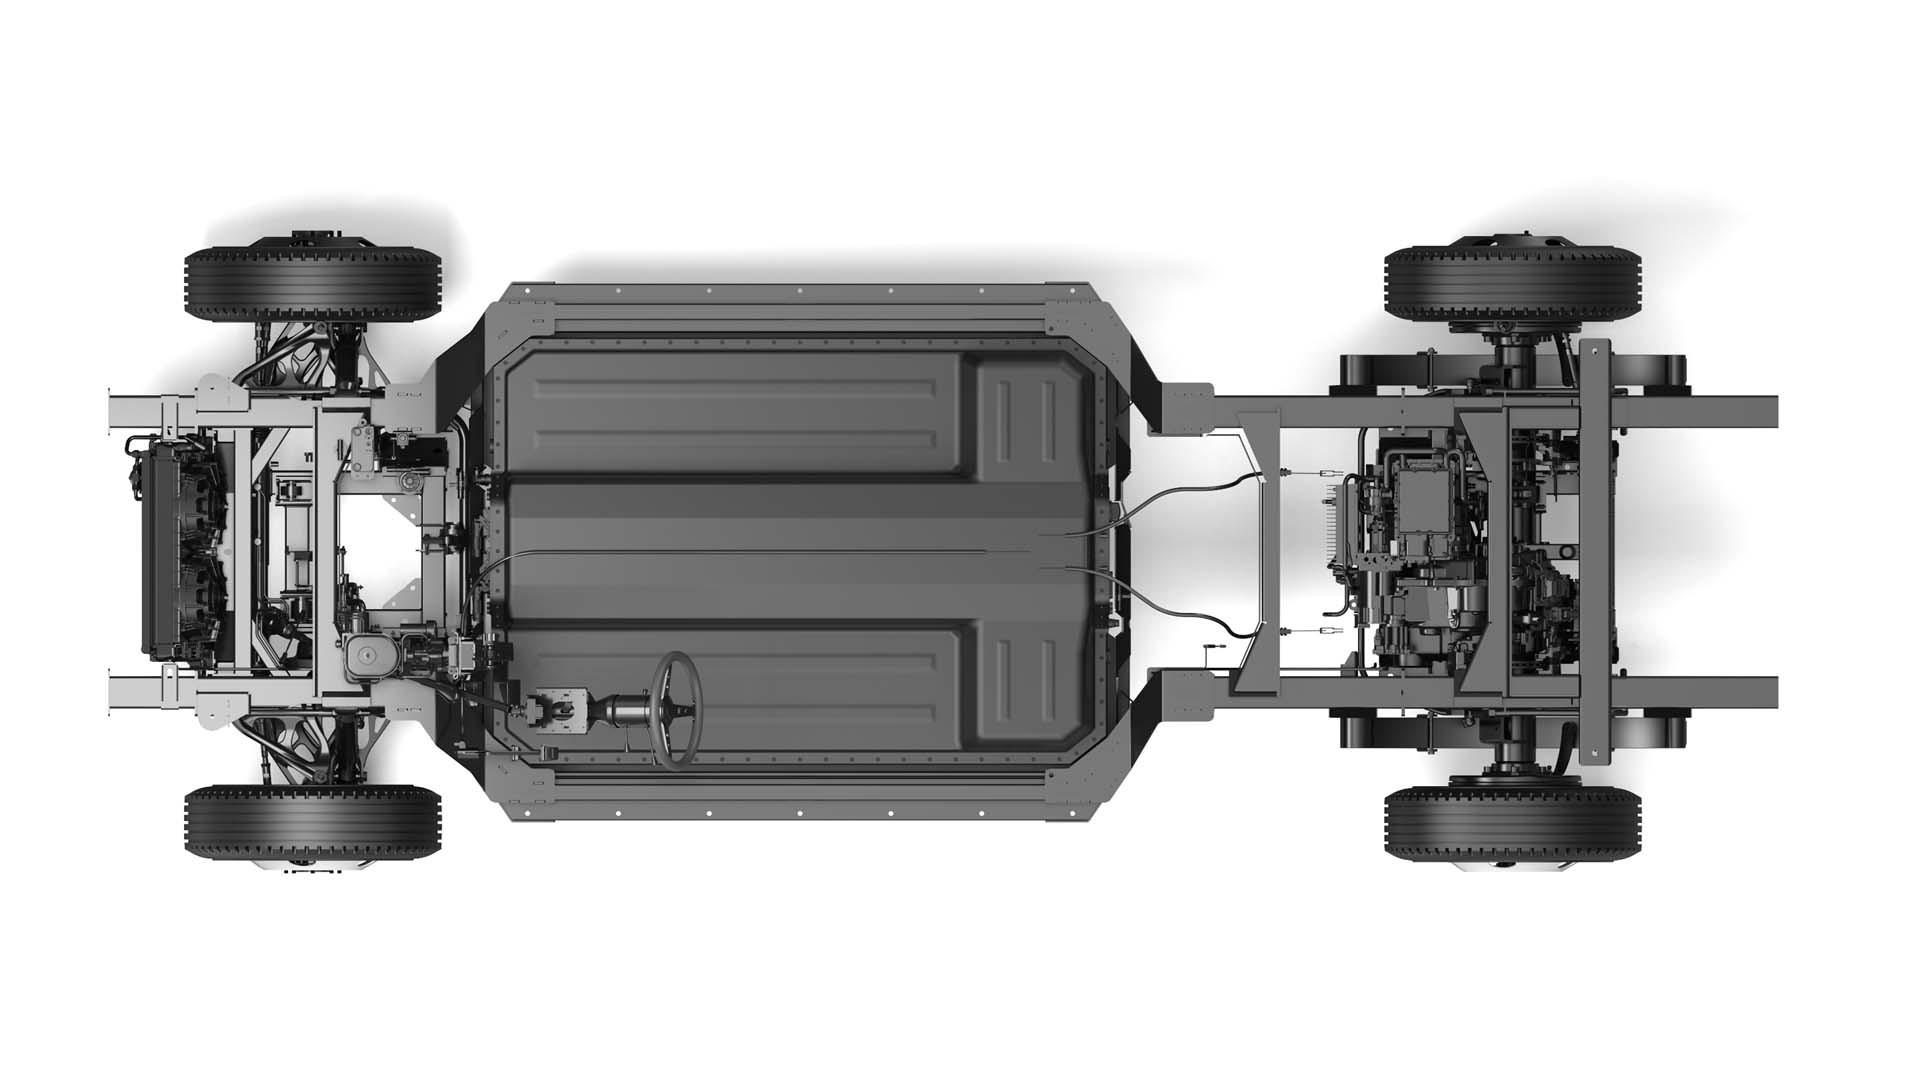 Bollinger Chass-E rear-wheel drive